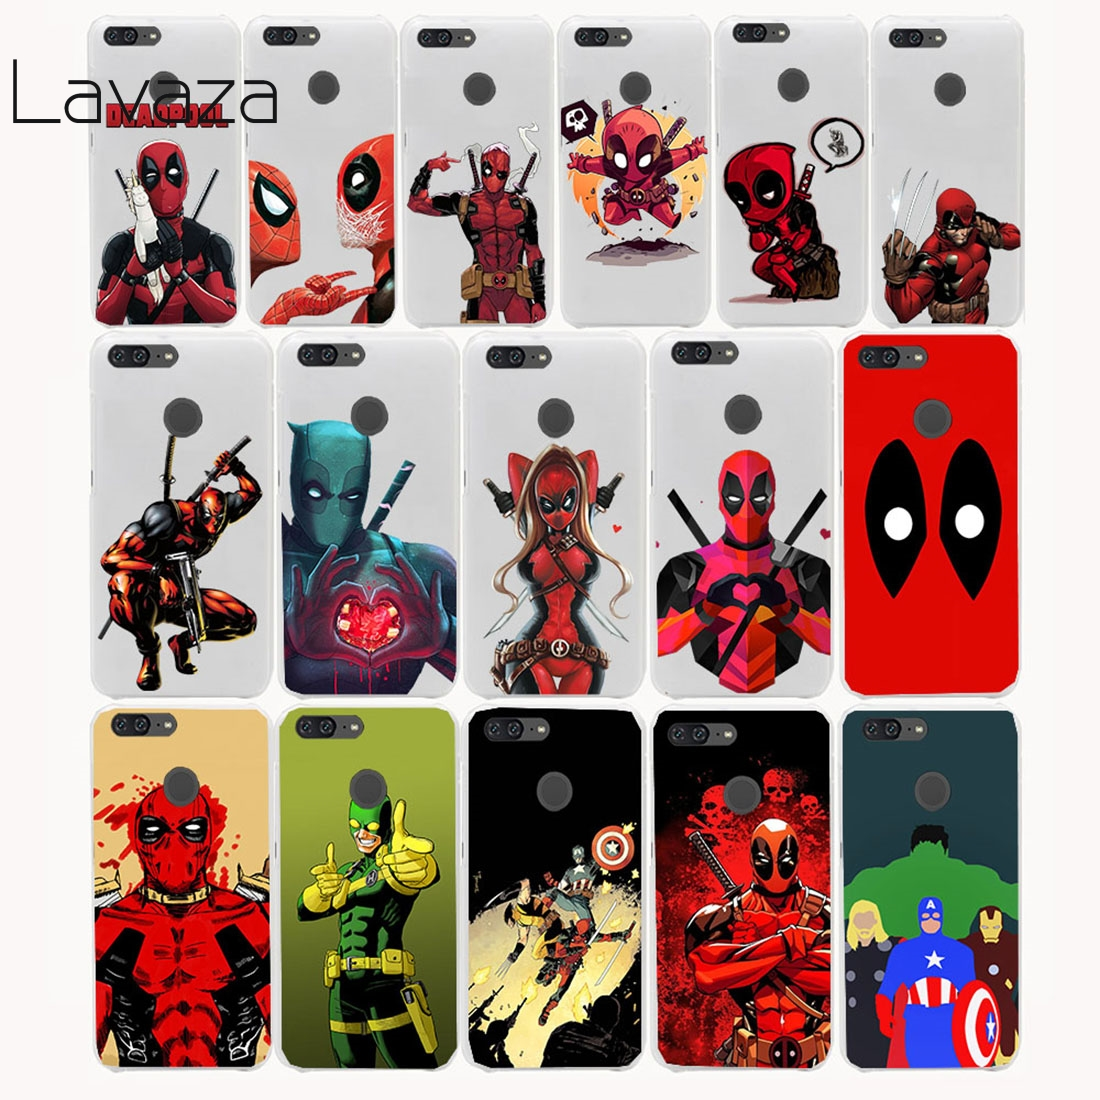 Lavaza 12FF Marvel Soldier Deadpool Hard Case for Huawei Honor 8 9 lite 6 6a 6x 7 7x Y3II Y5II Y6II Y3 Y5 Y6 2017